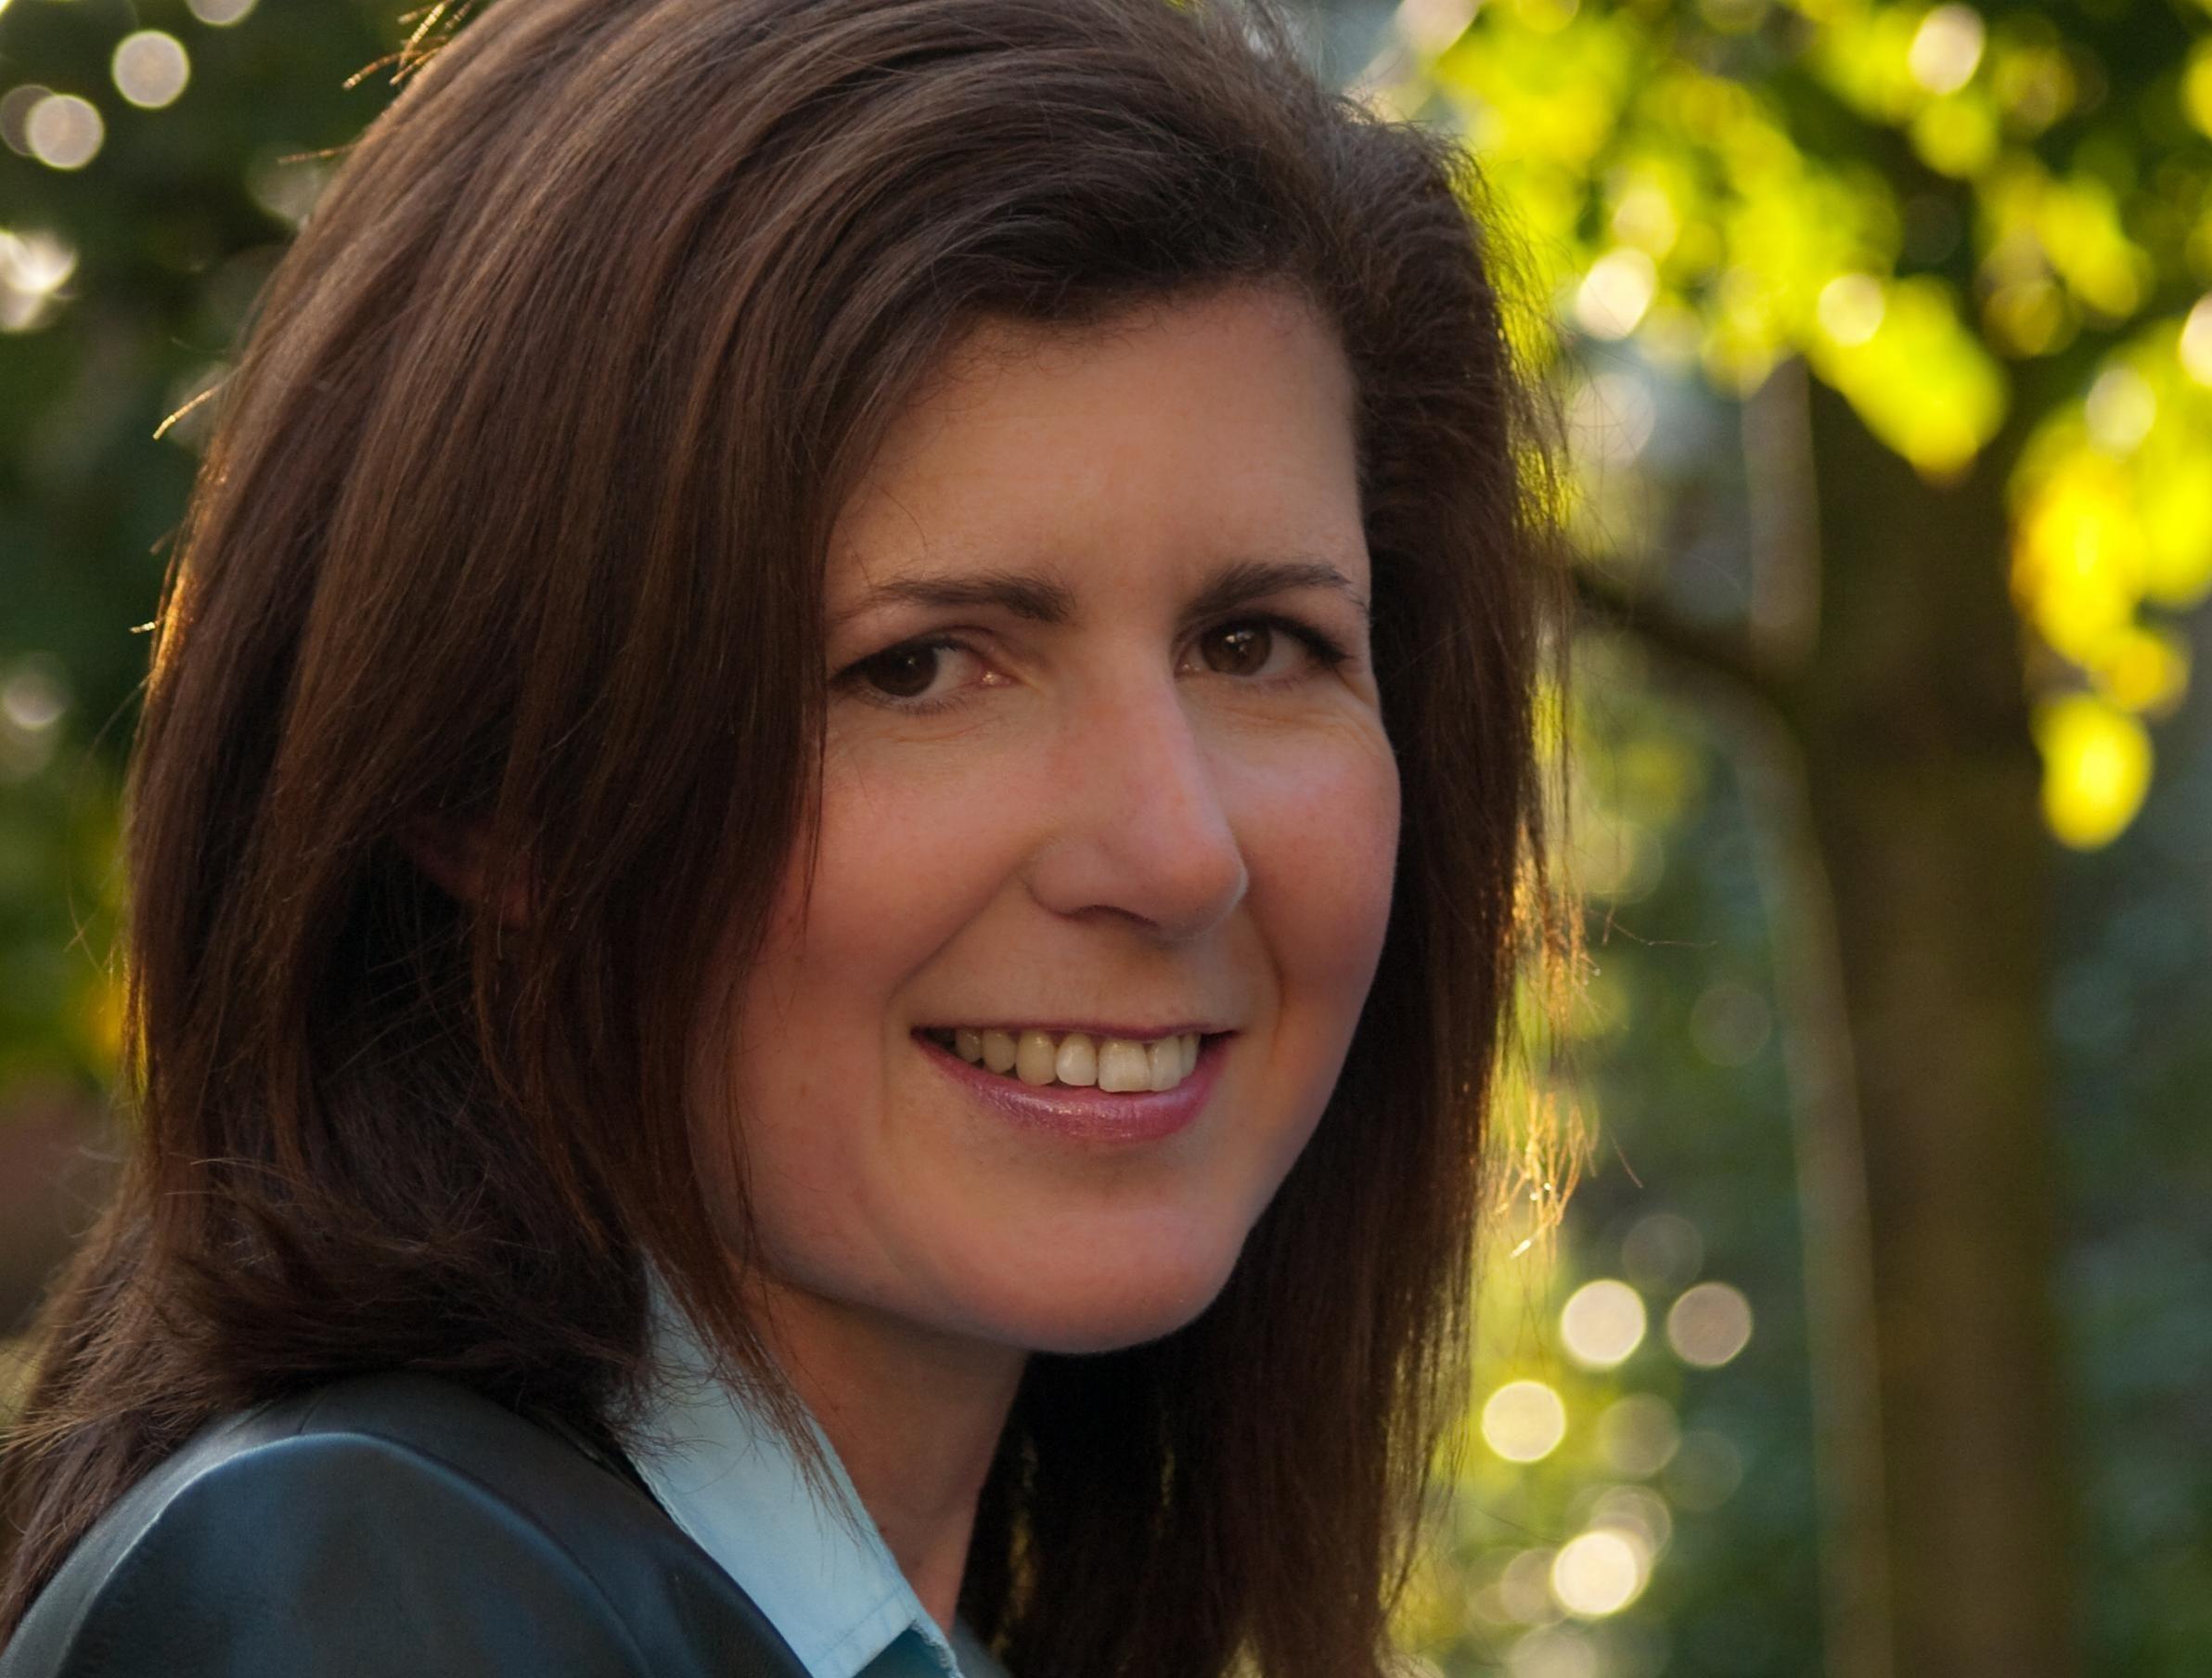 MP Jenny Chapman